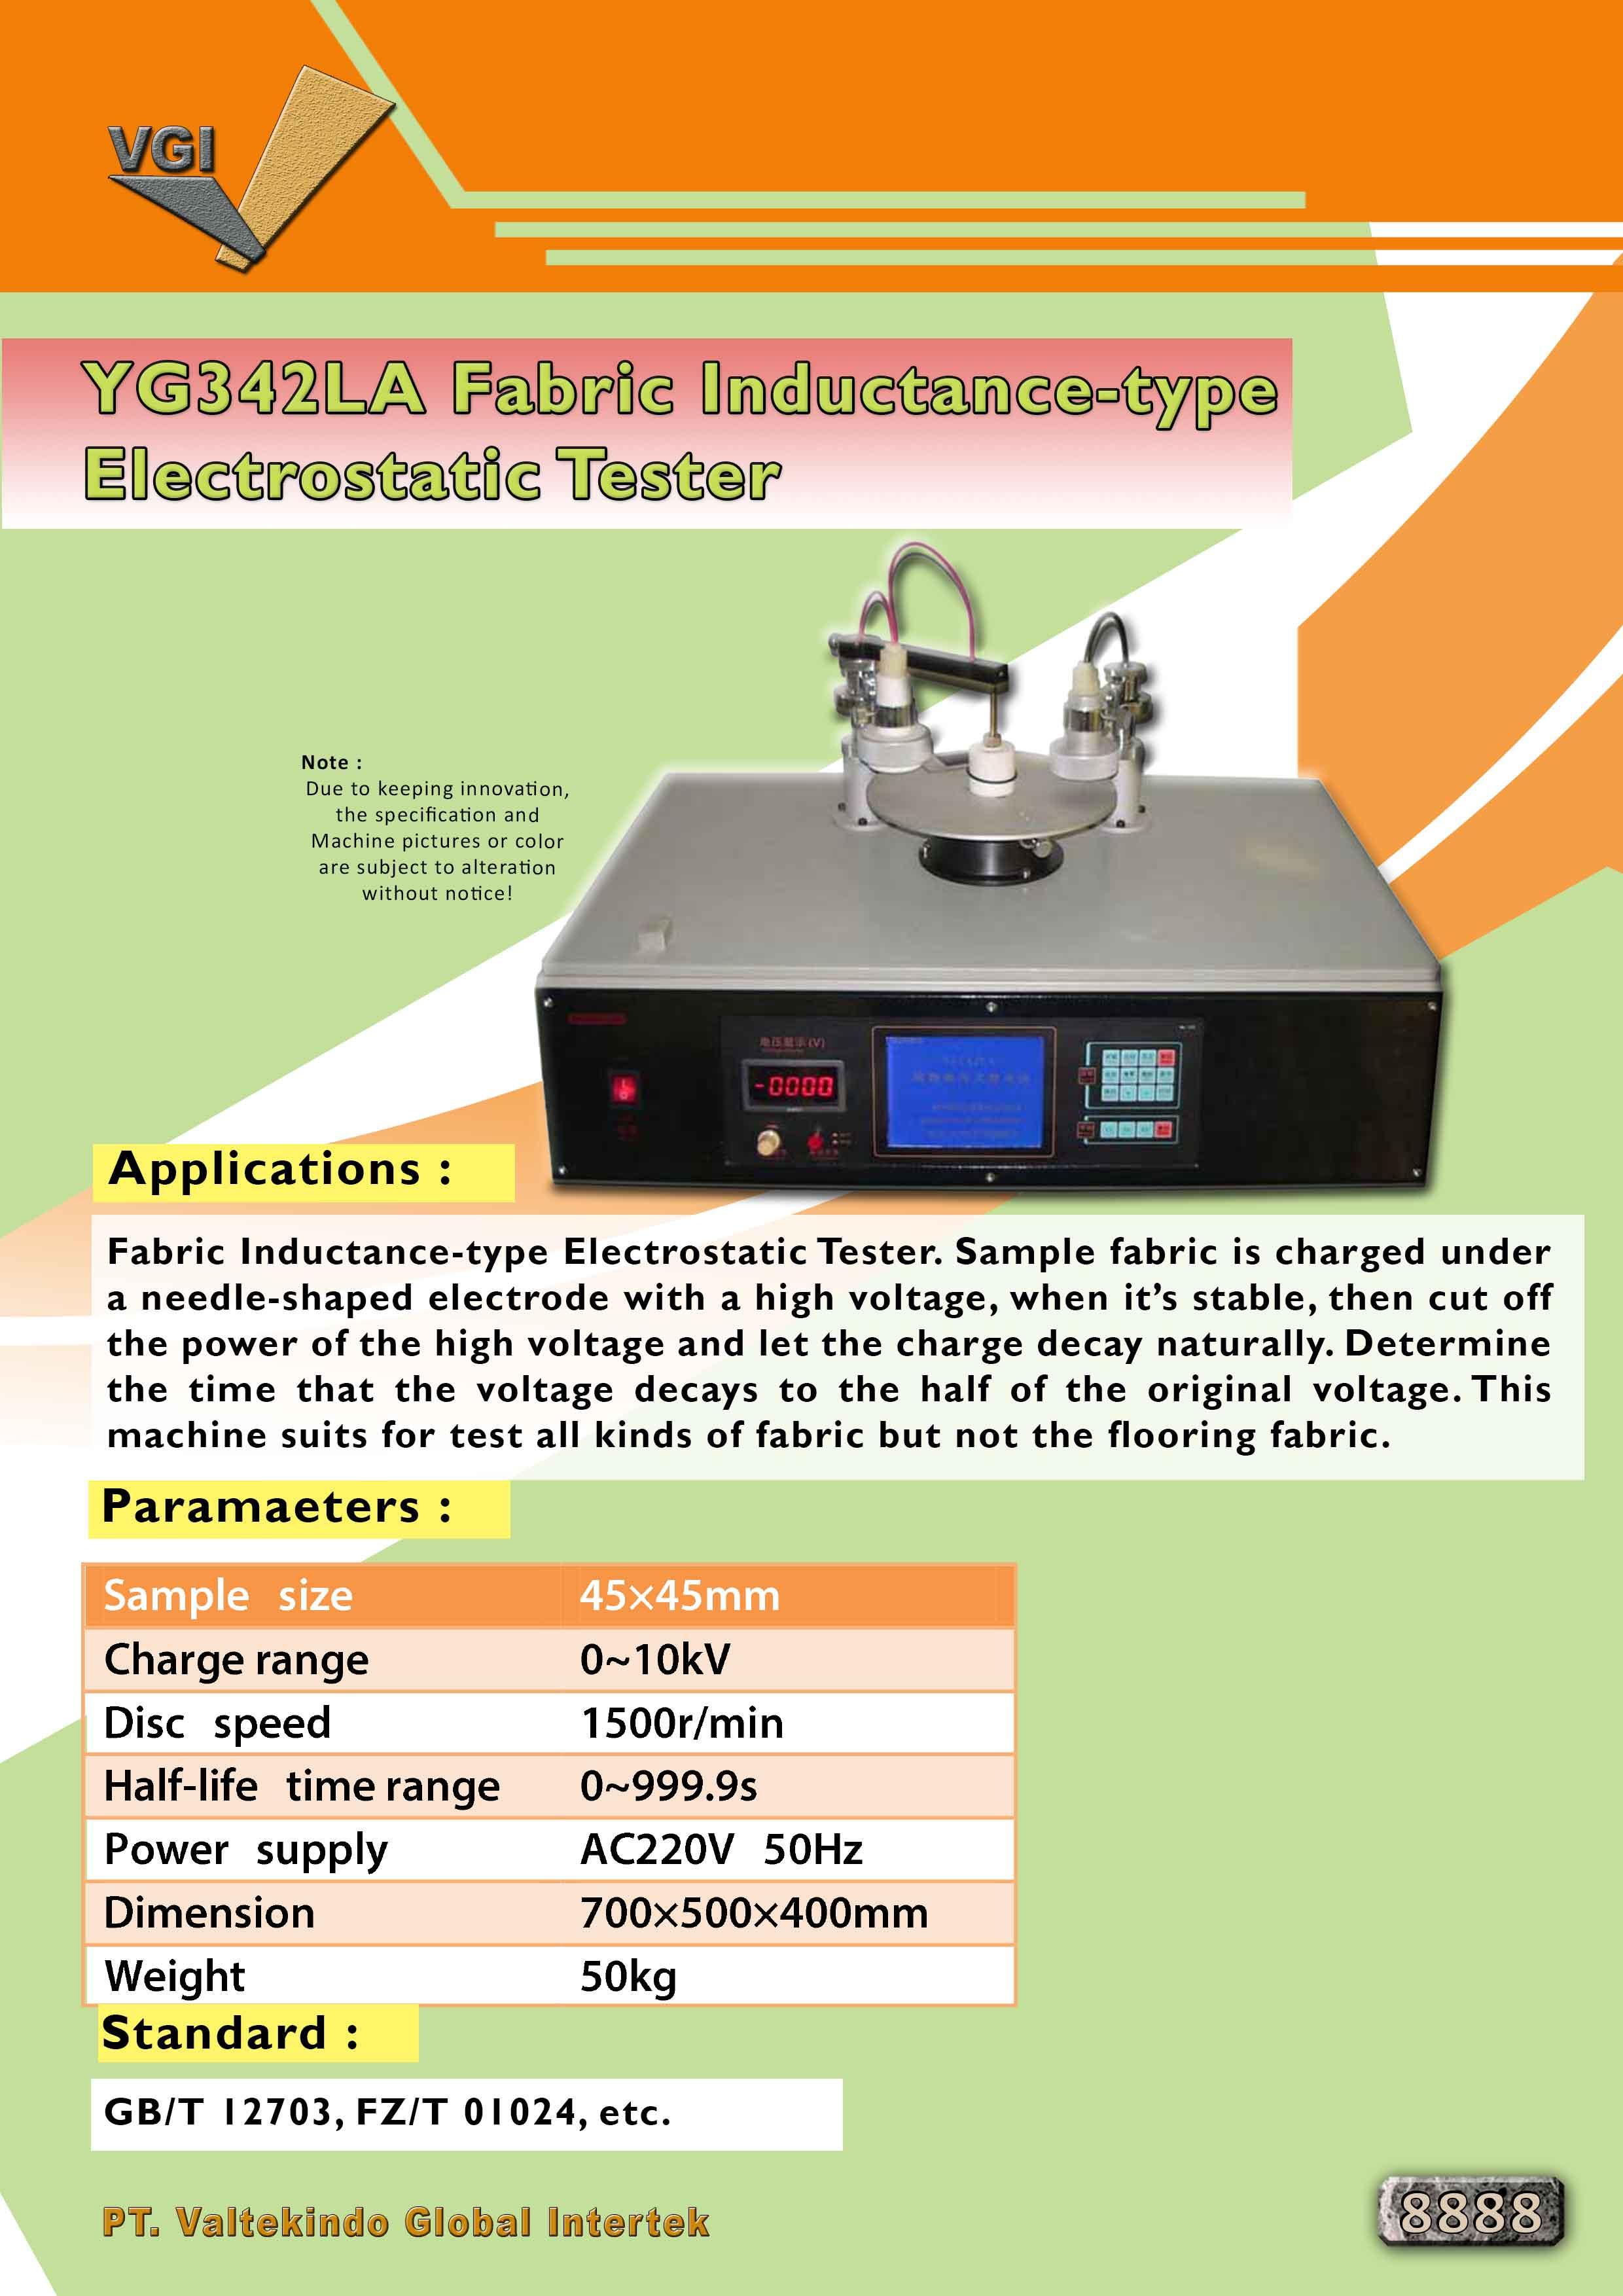 jual mesin Fabric Industance Type Electrostatic Tester  Fabric Industance Type Electrostatic Tester